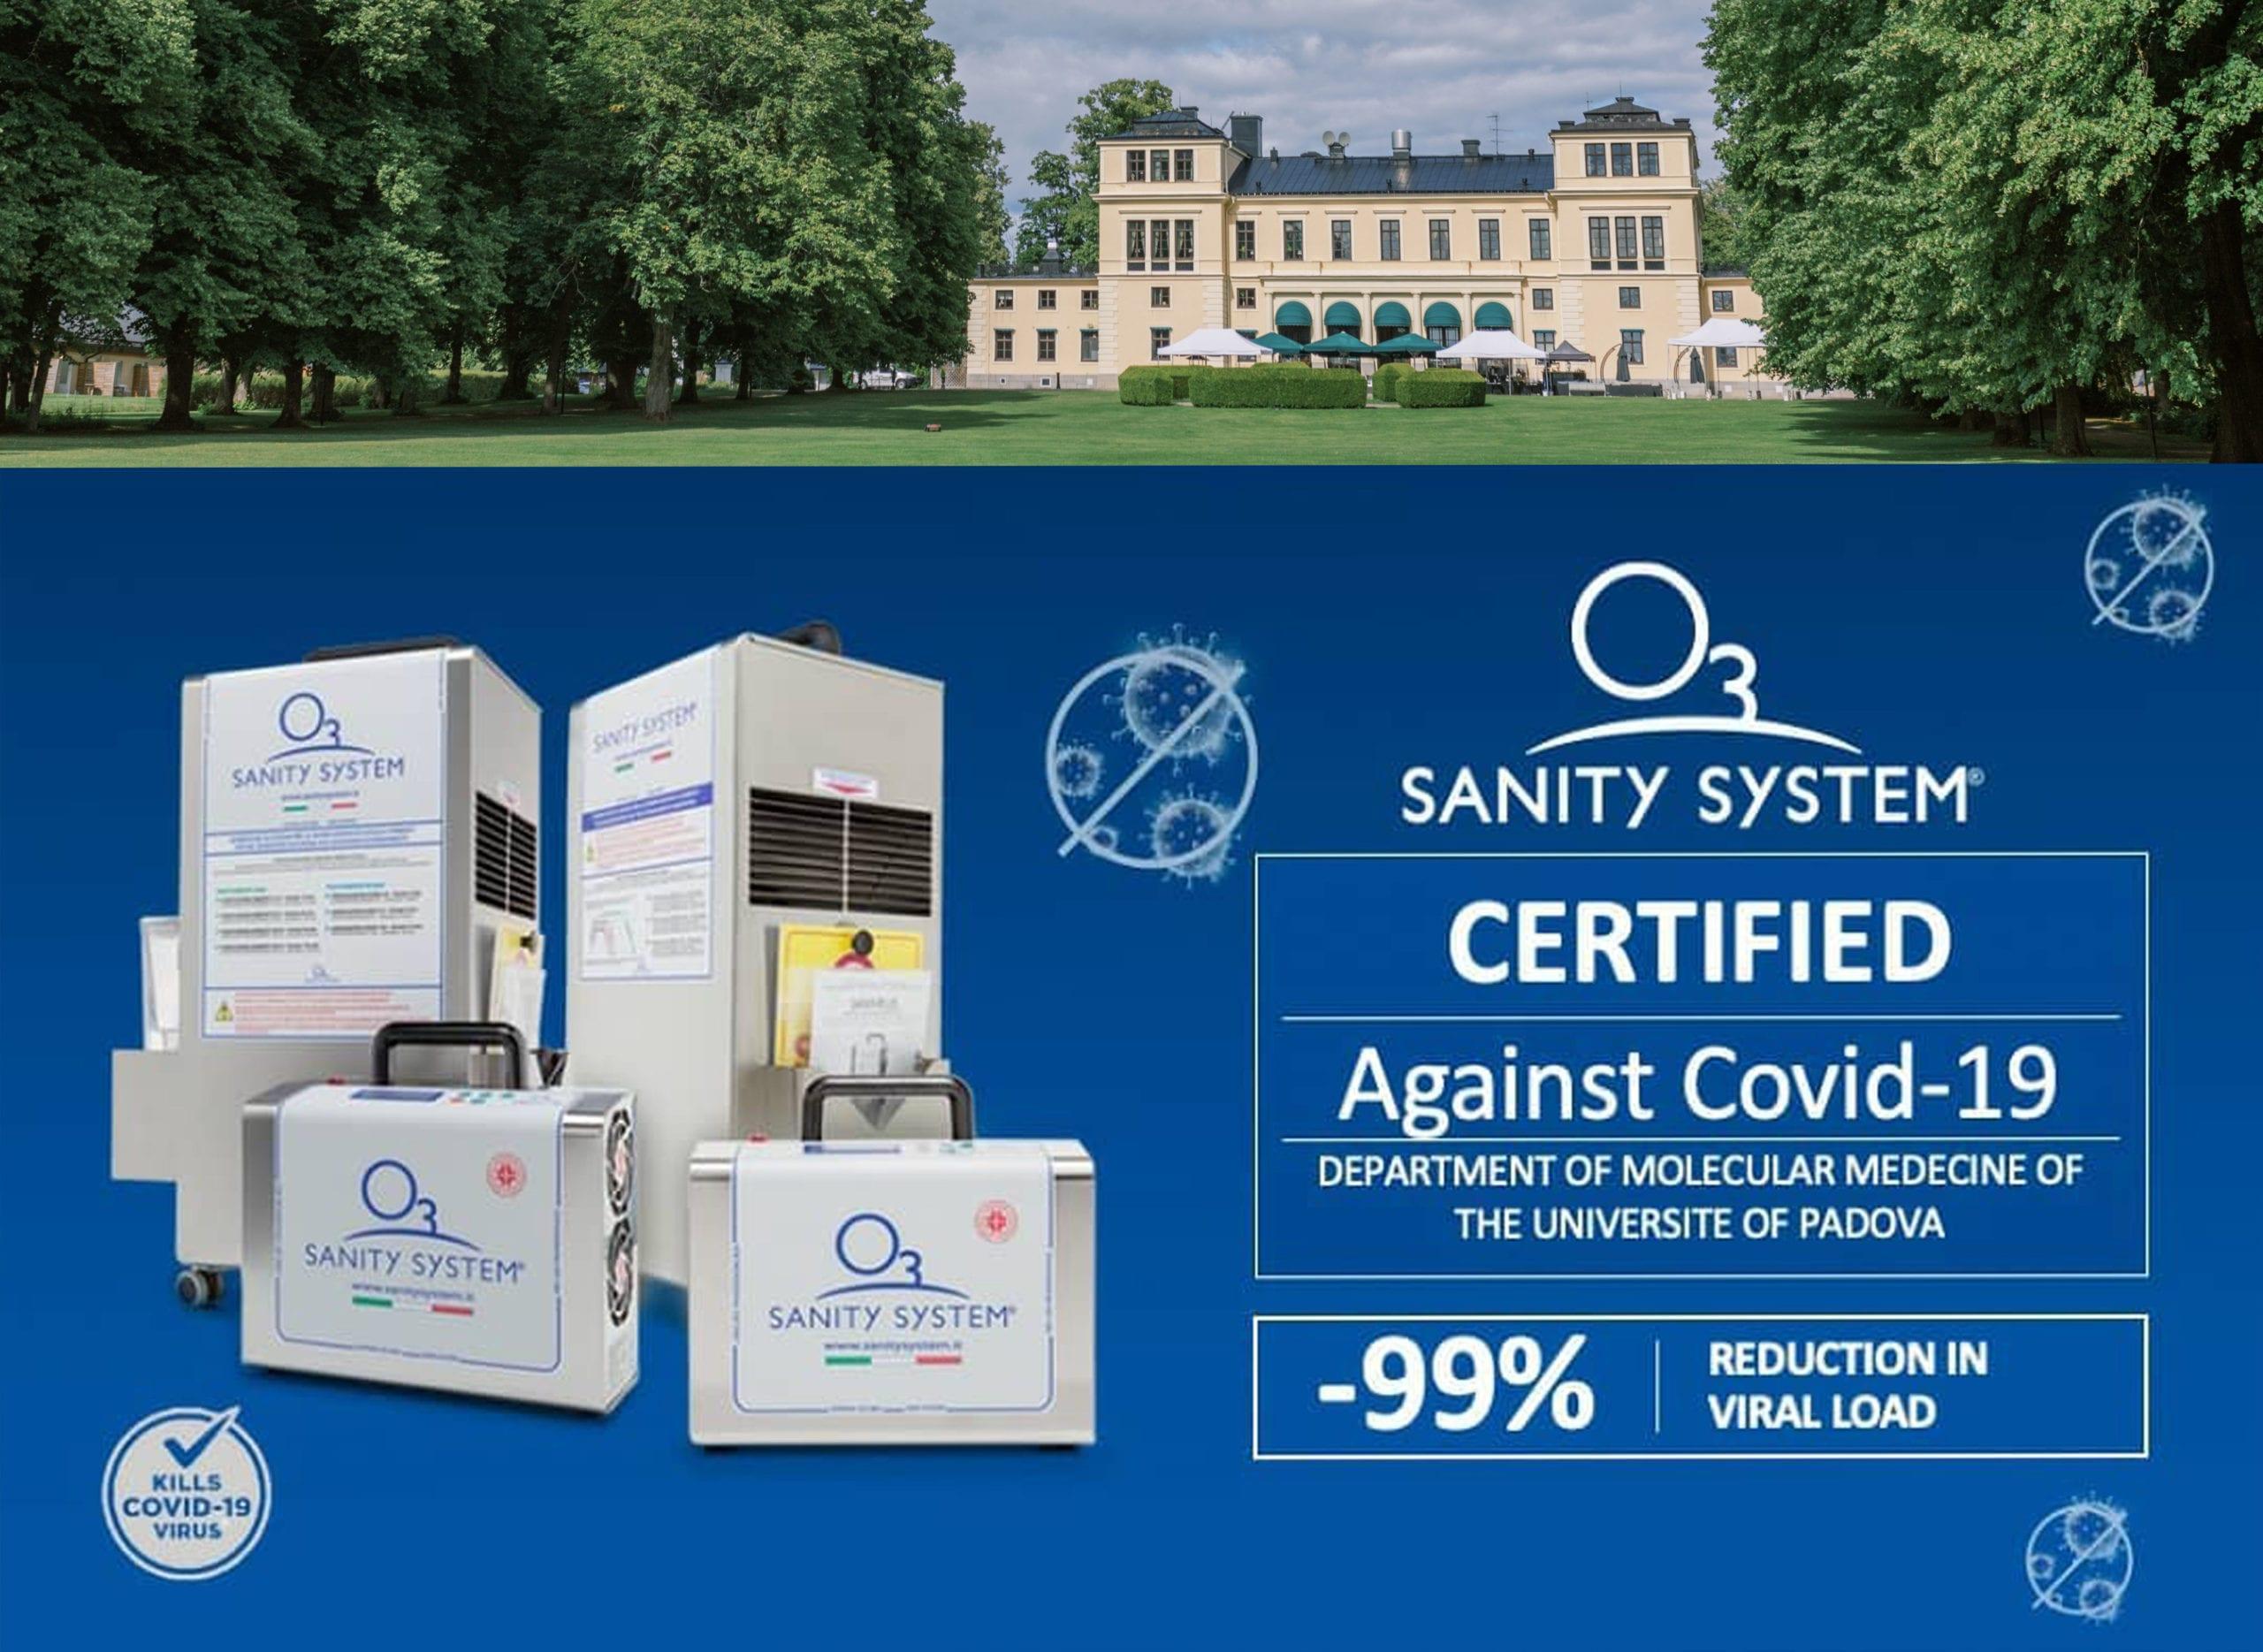 Bild på Sanity systems produkter samt slottsbild